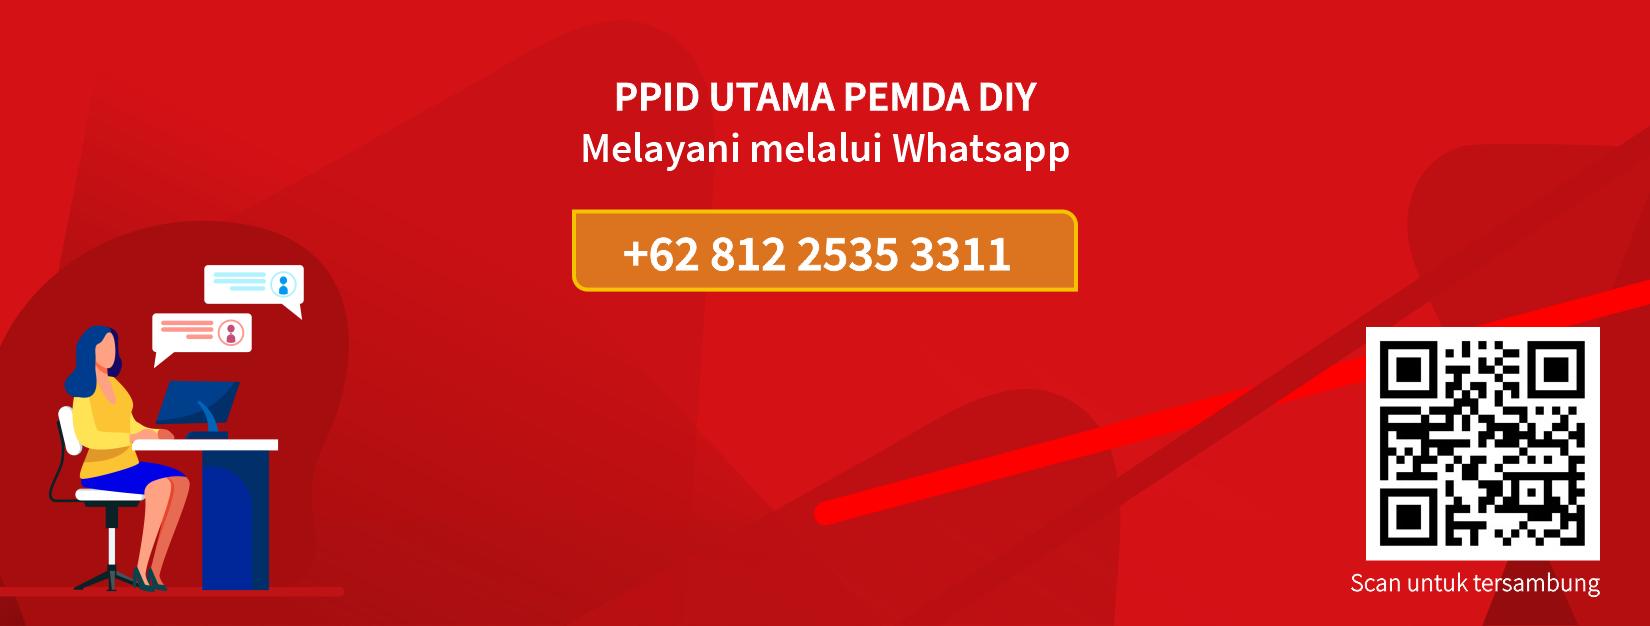 Whatsapp PPID